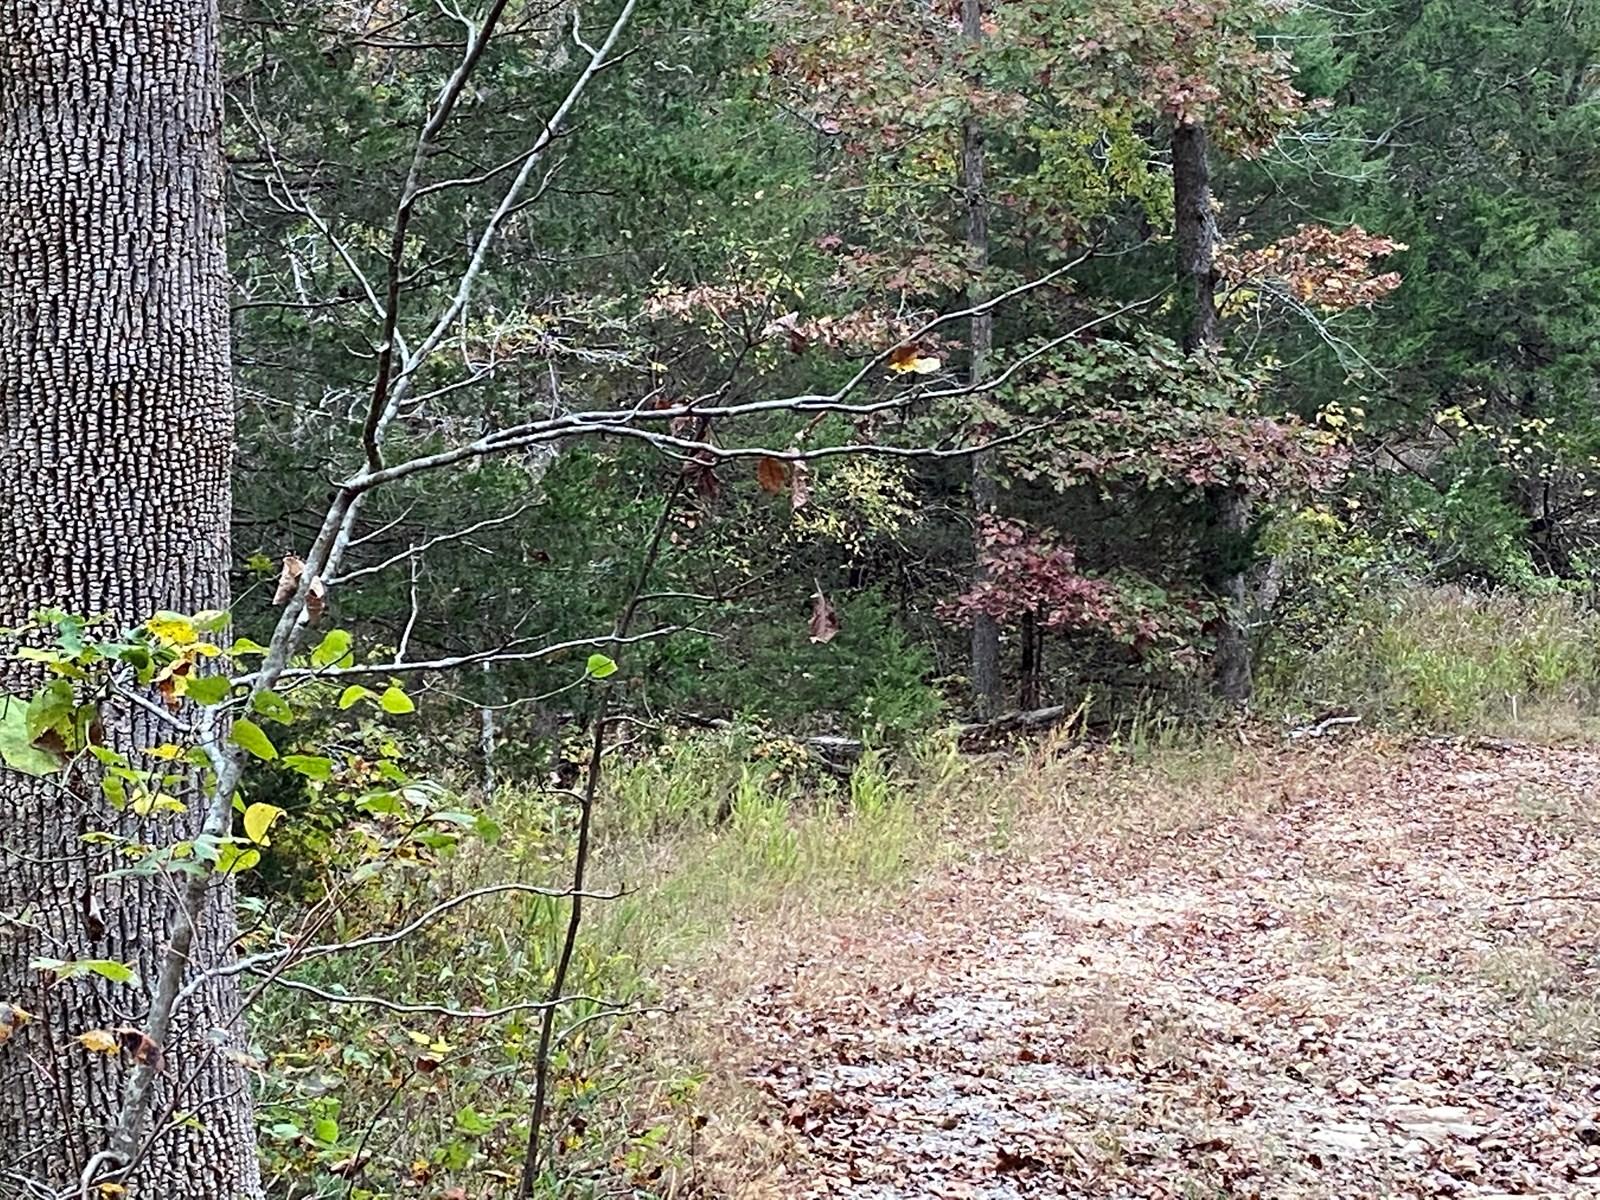 AR Recreational property Deer Hunting Land 11 acres woods